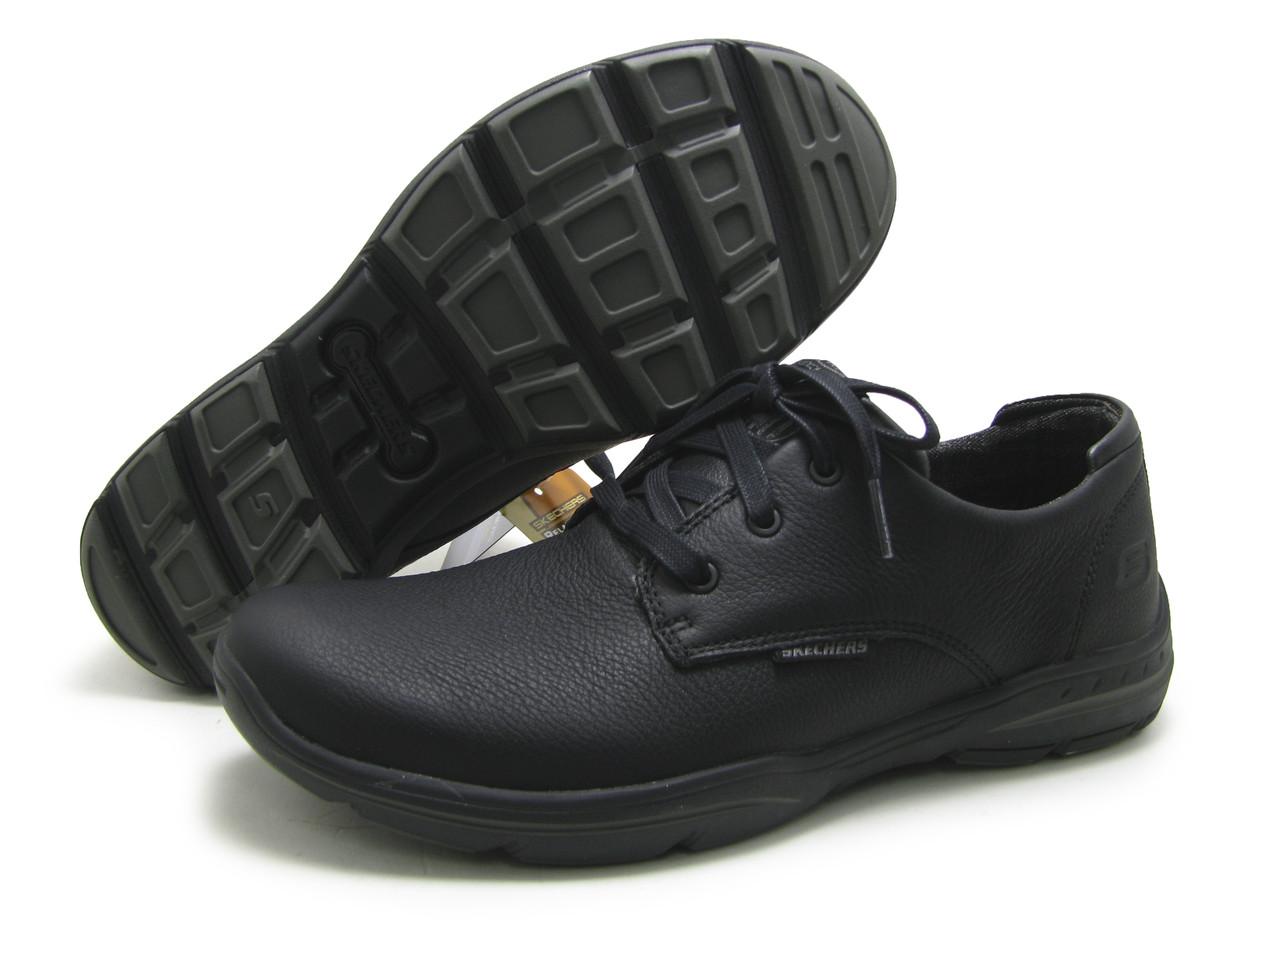 Туфли спортивные Skechers 64856 BBK Men's Harper - Epstein